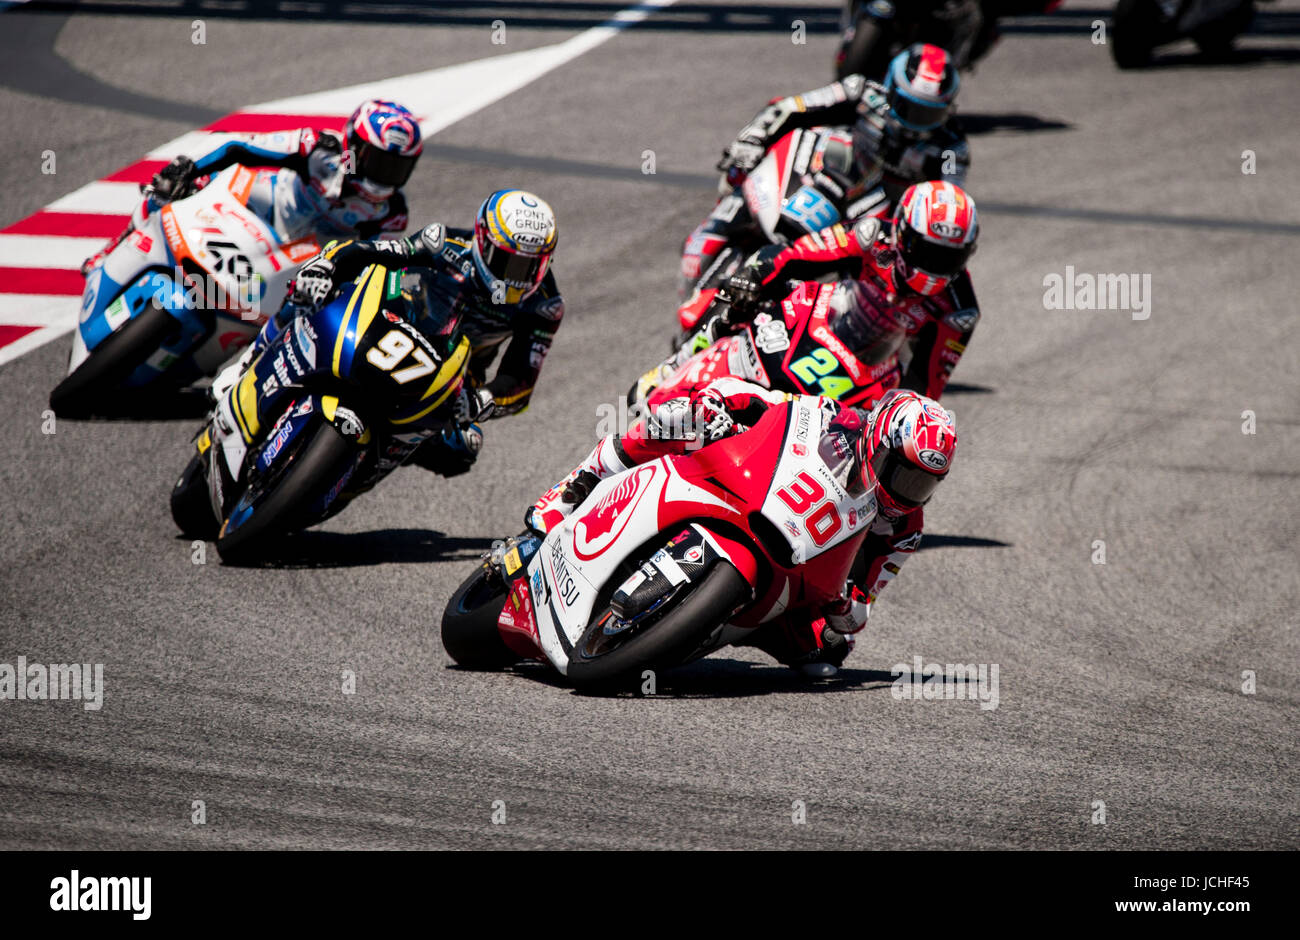 Takaaki Nakagami; of IDEMITSU Honda Asia Moto2 Team leads during Motogp, Gran Premi Monster Energy de Catalunya - Stock Image